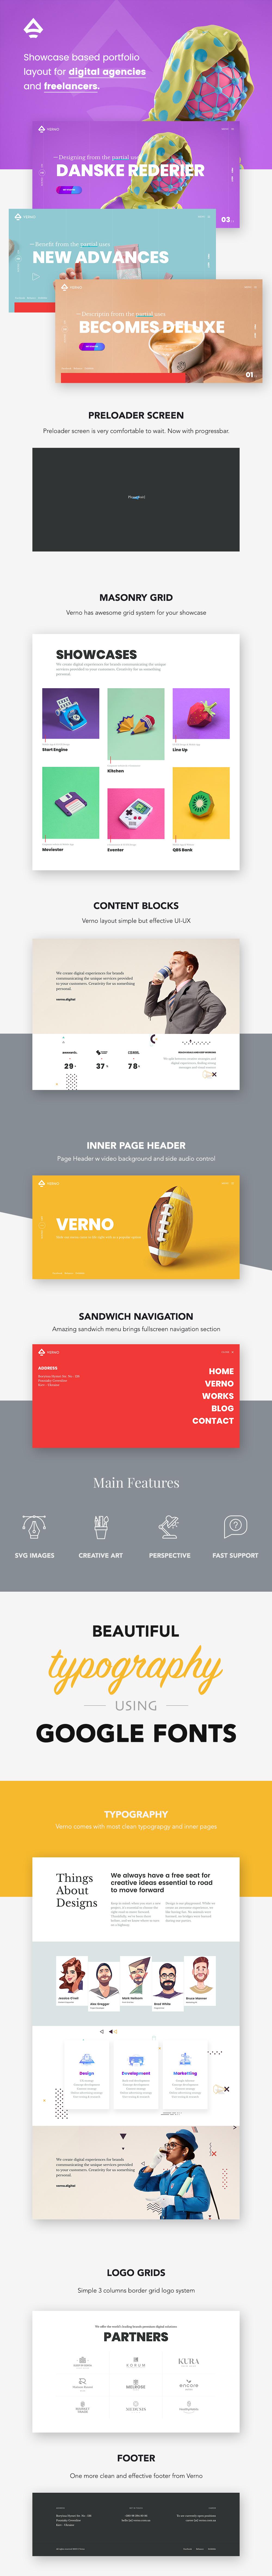 Verno | Creative Showcases for Agencies - 1